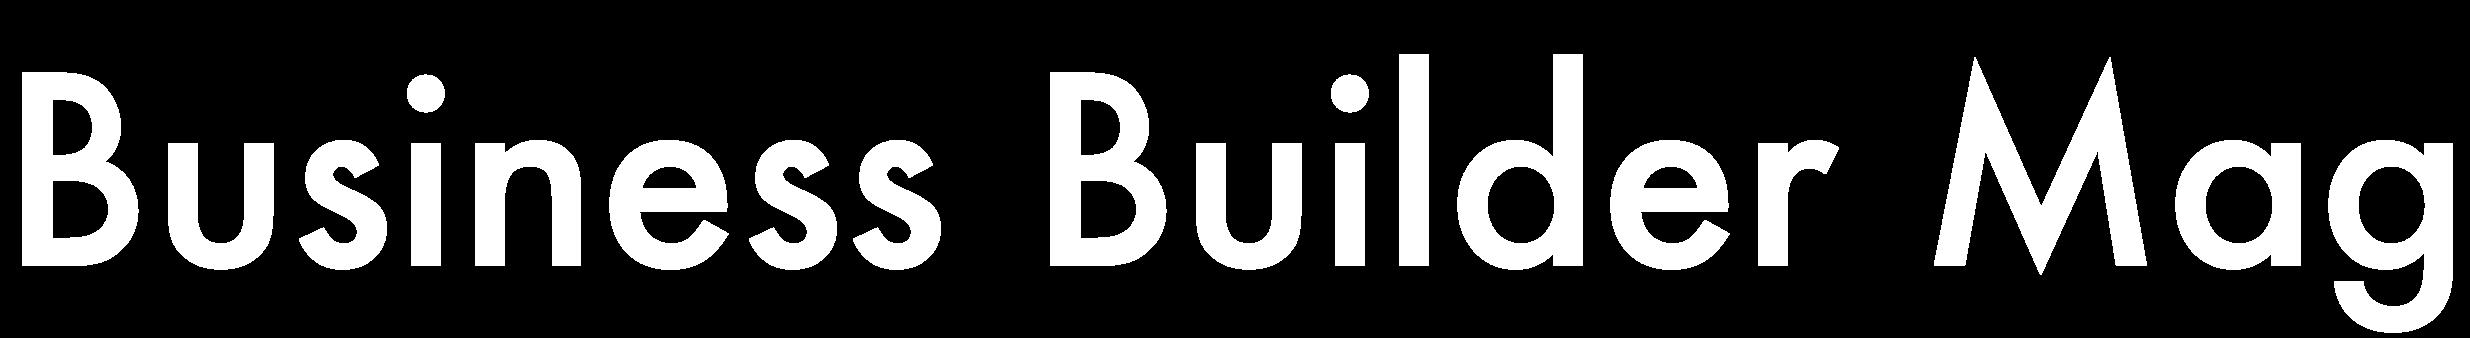 Business Builder Mag